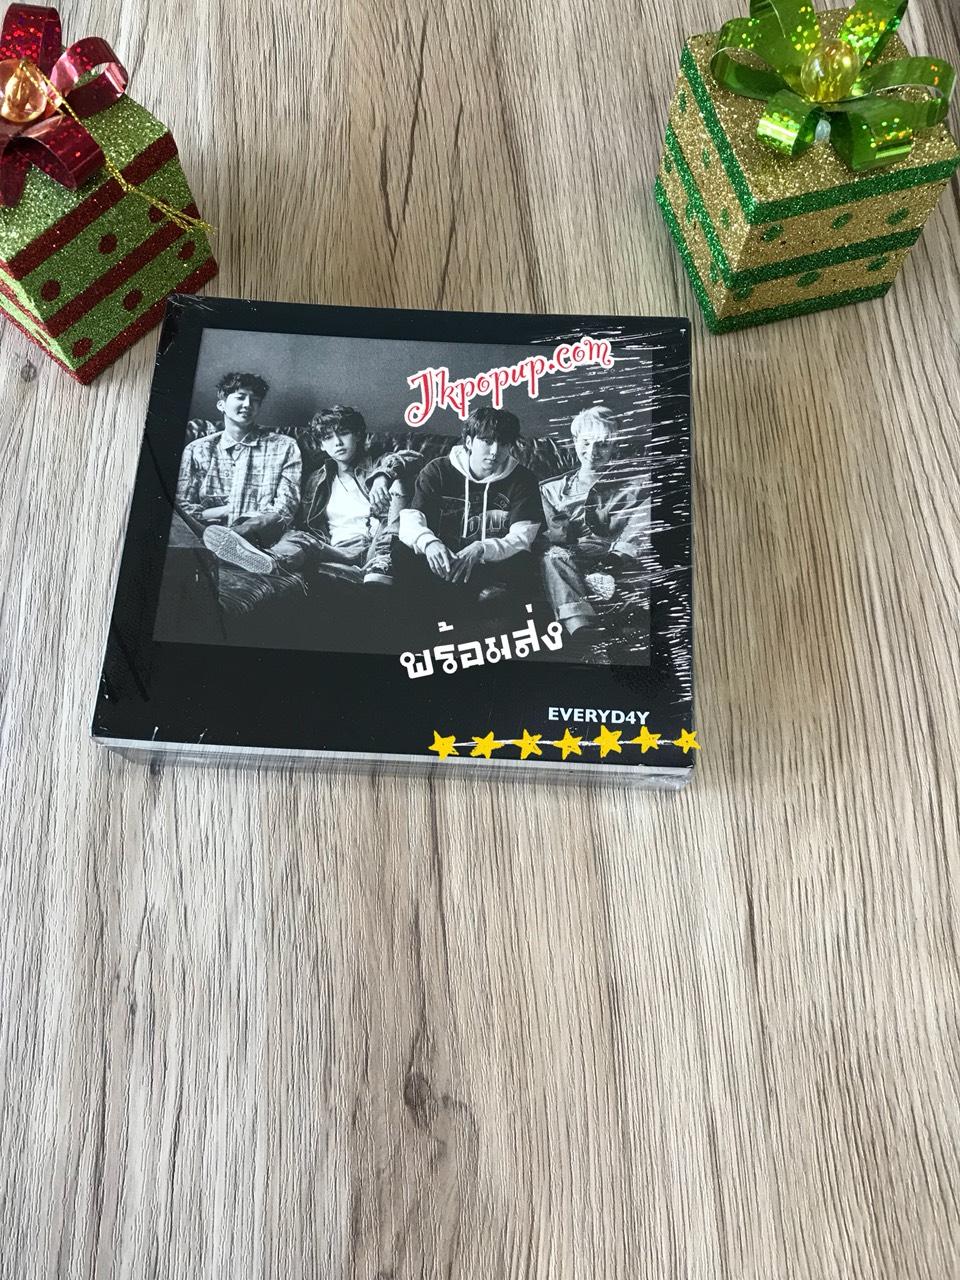 WINNER - Album Vol.2 [EVERYD4Y] หน้าปก Night Ver. + โปสเตอร์ พร้อมกระบอกโปสเตอร์ พร้อมส่ง